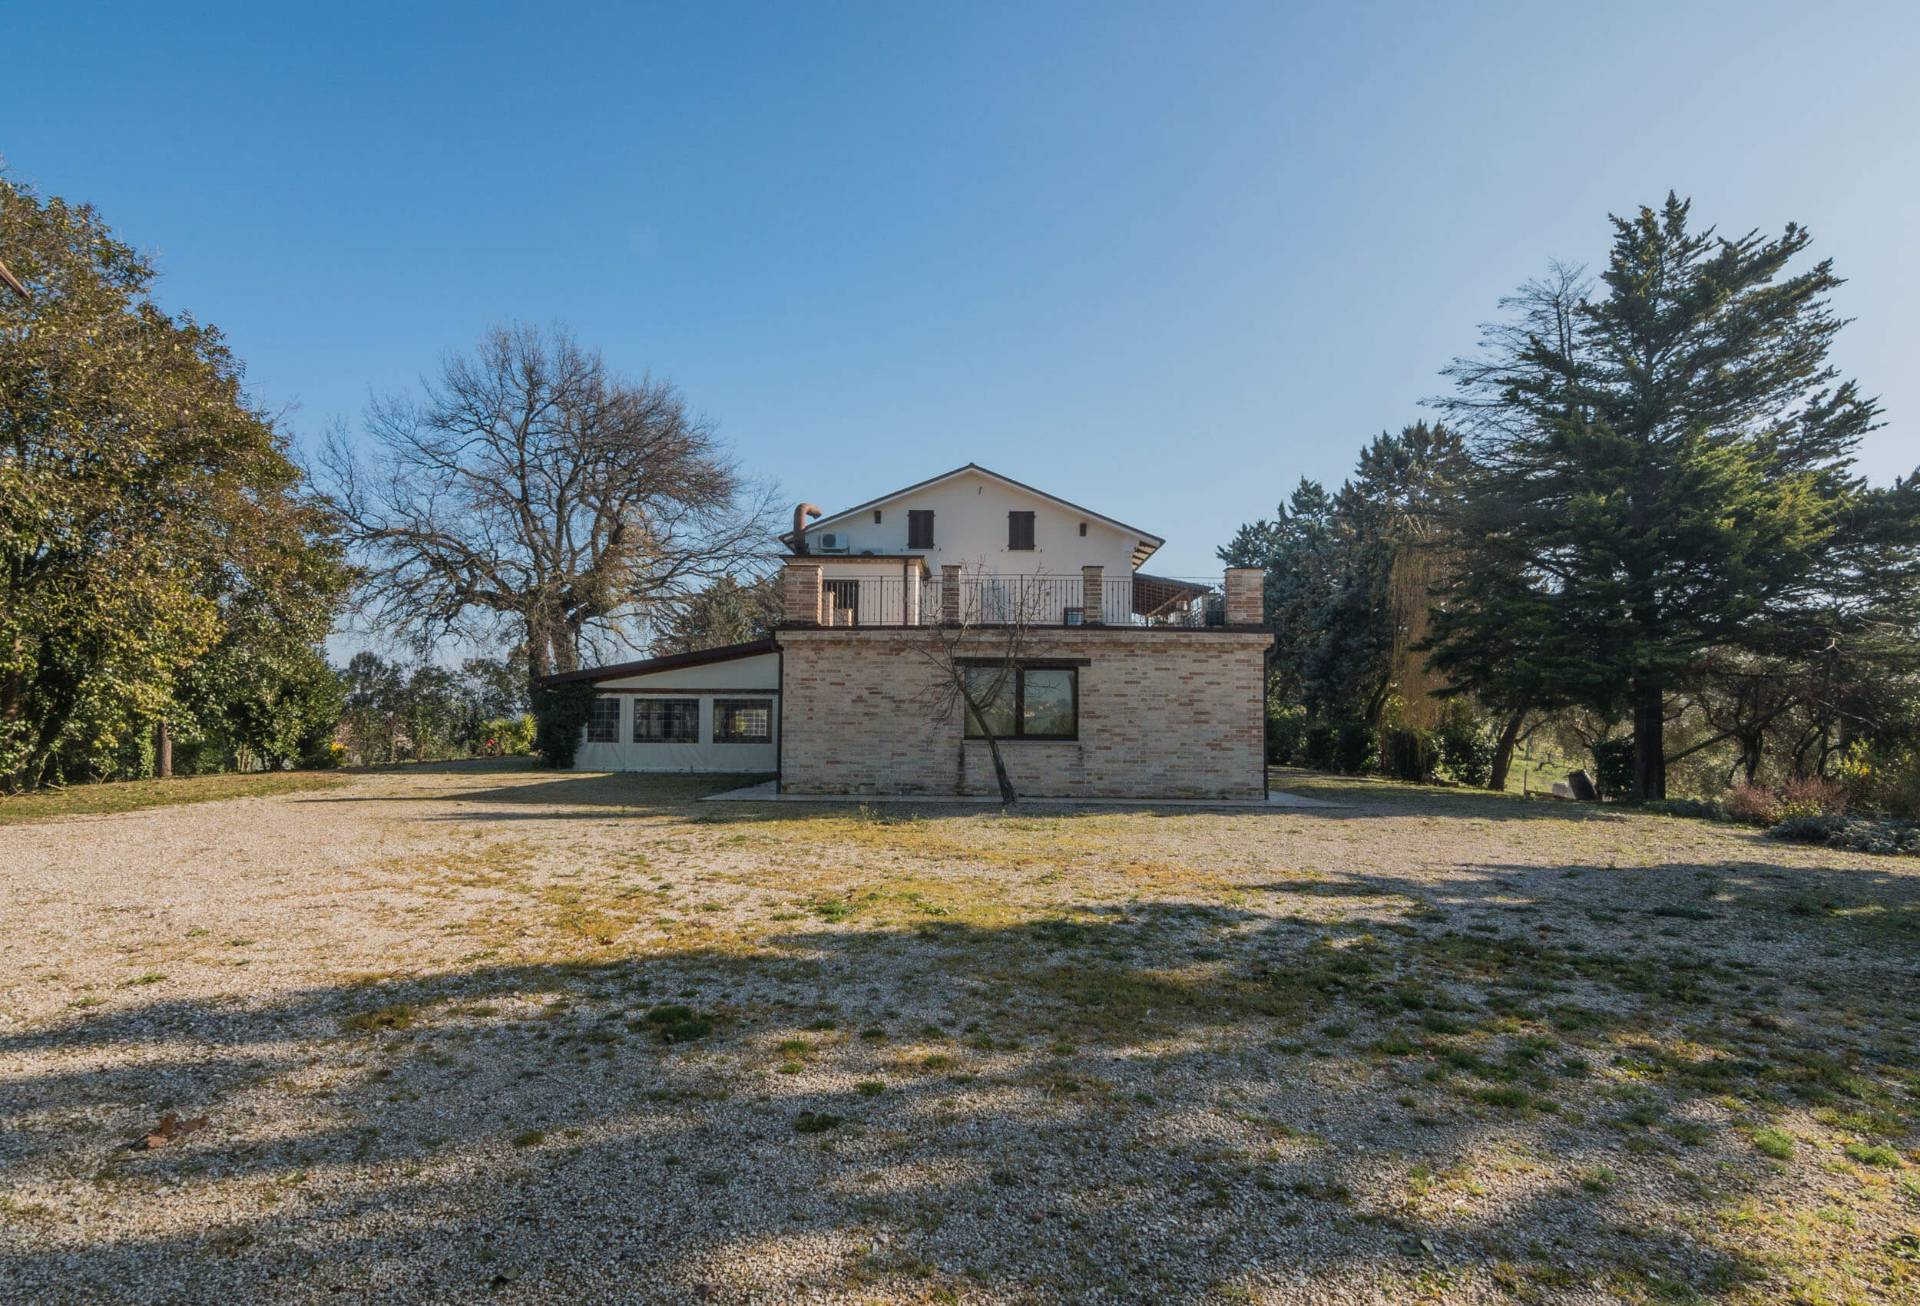 Casale a Monte San Pietrangeli (Fermo)